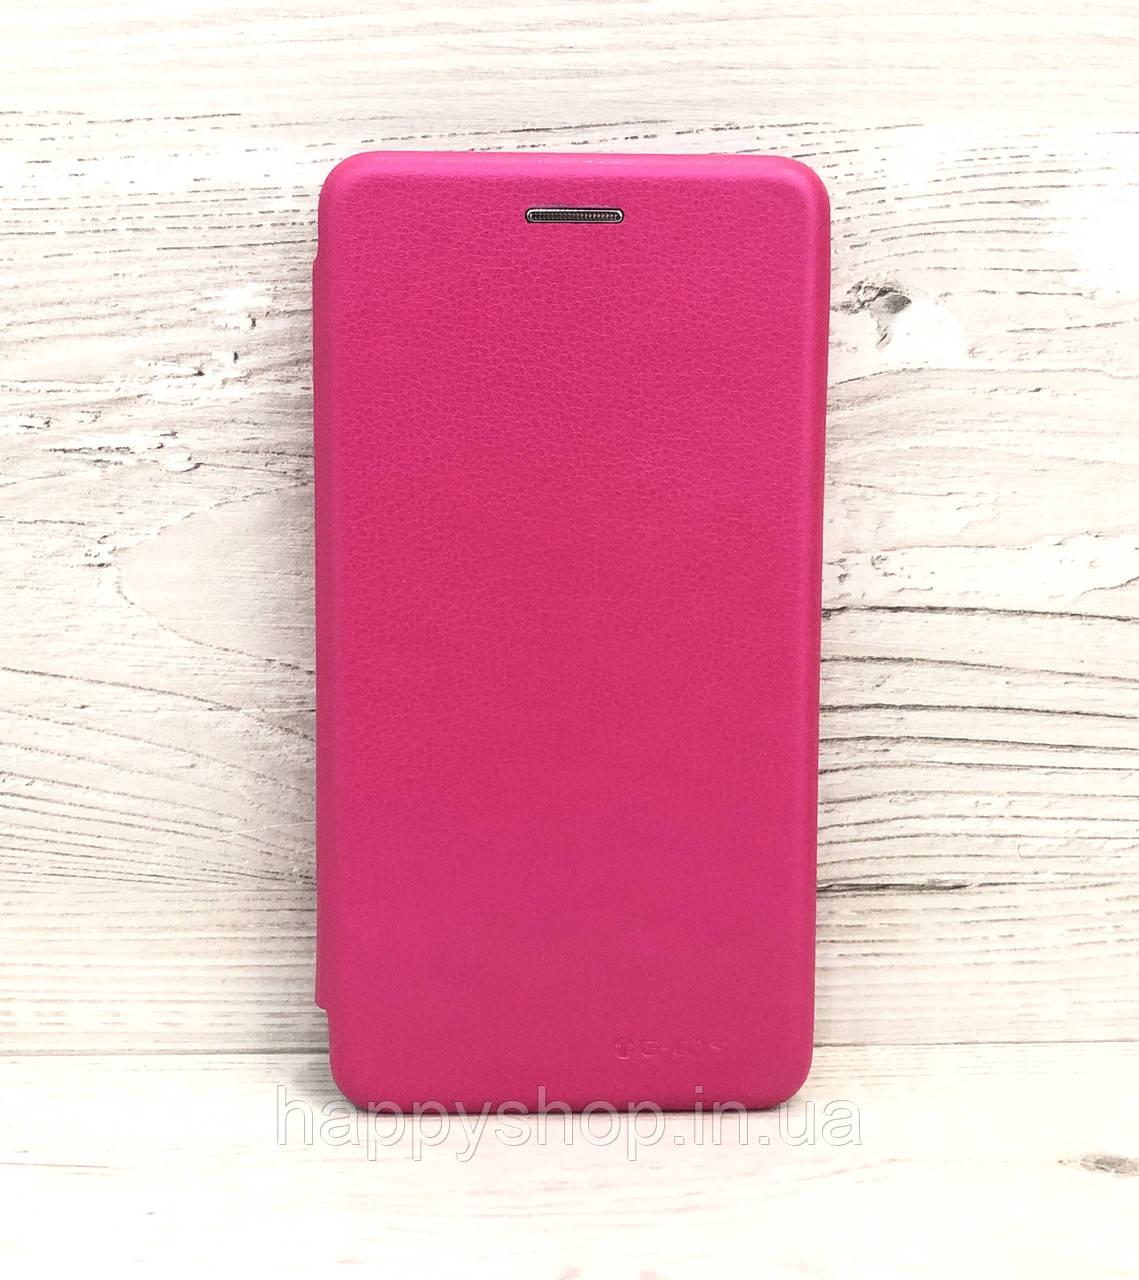 Чехол-книжка G-Case для Huawei Y5 2019 (Розовый)